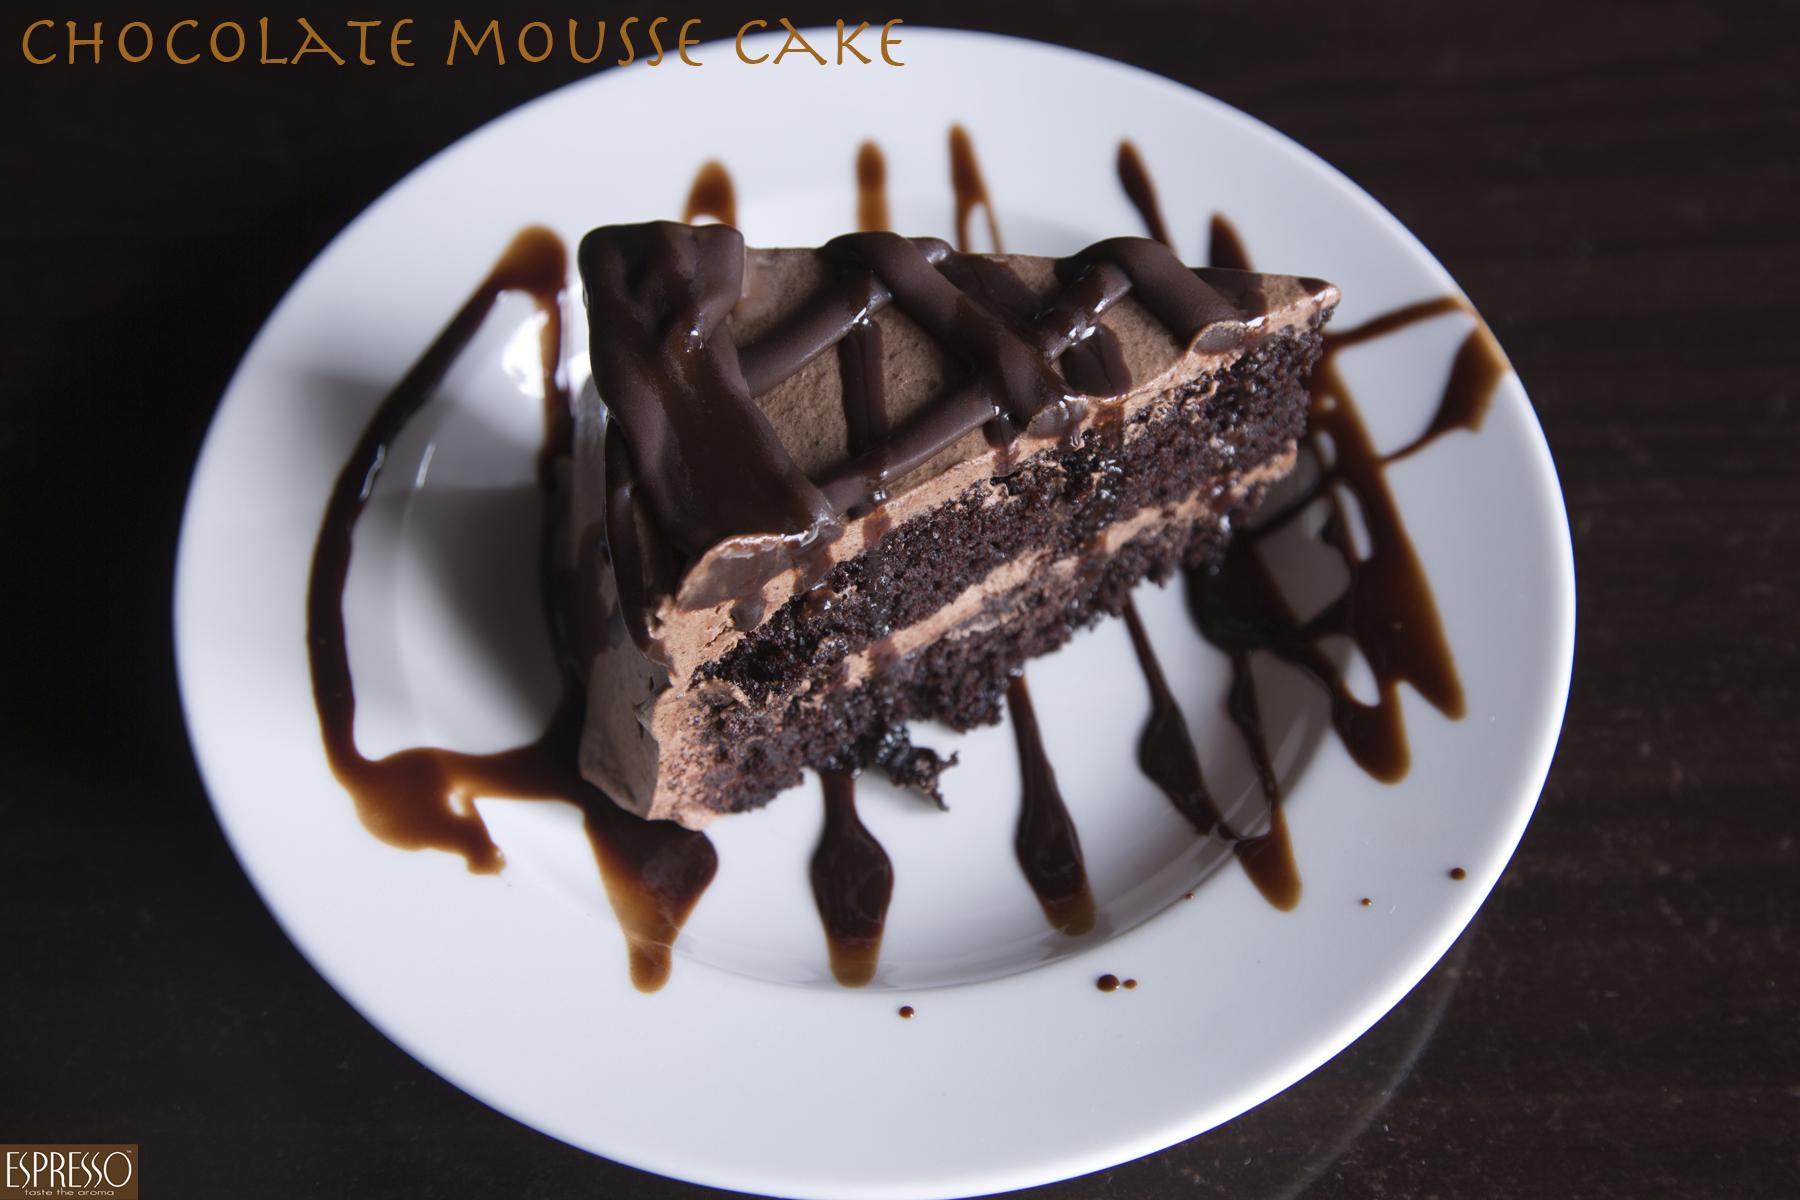 Chocolatemoussecake2.jpg